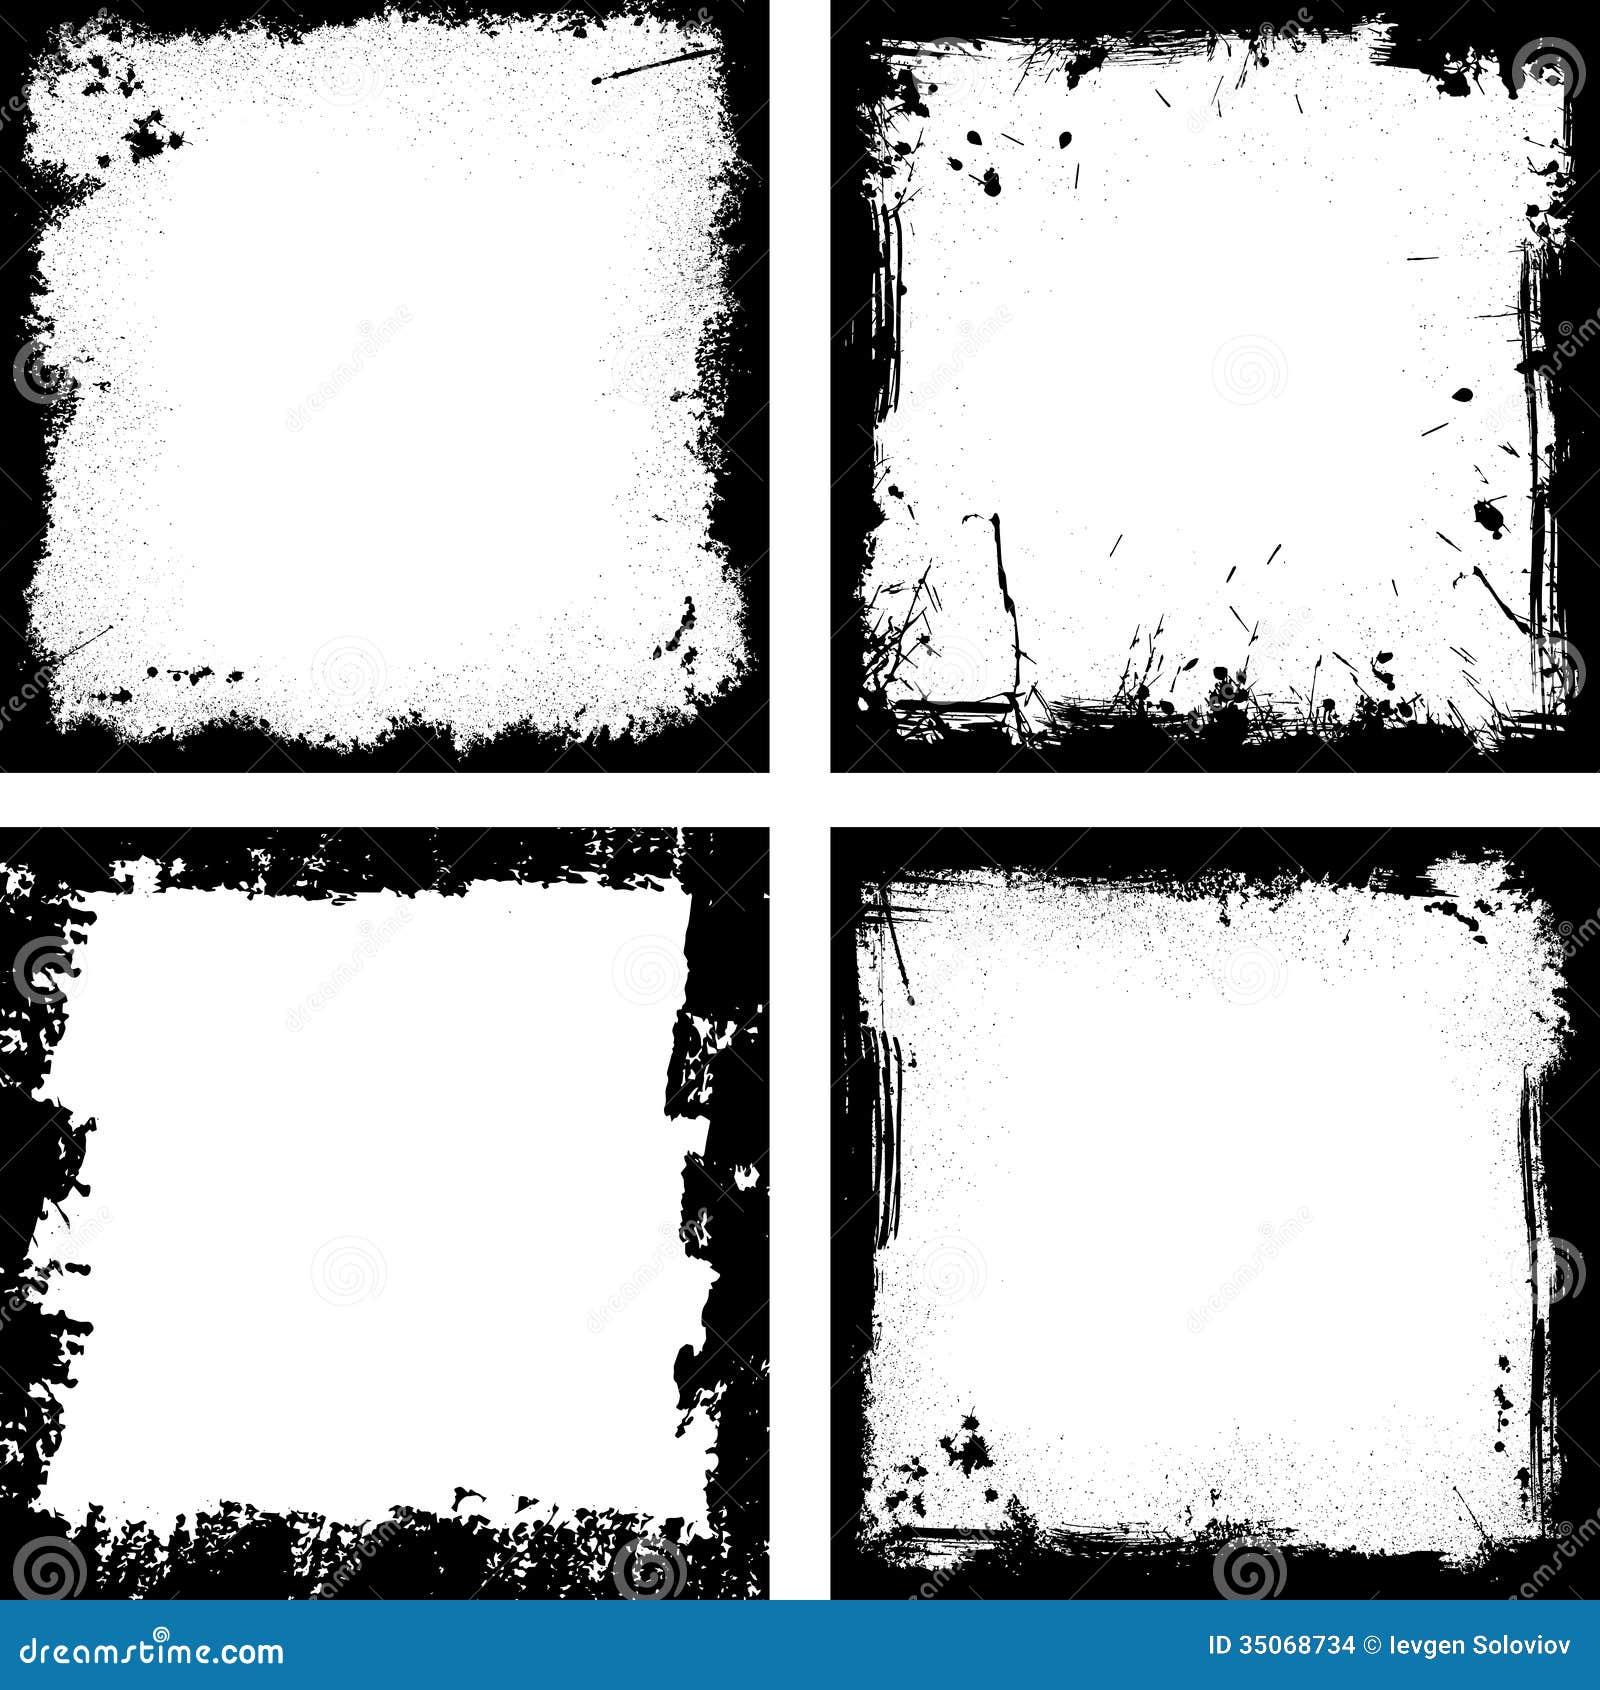 Asombroso Marcos De Cuadros Negros Embellecimiento - Ideas de Arte ...